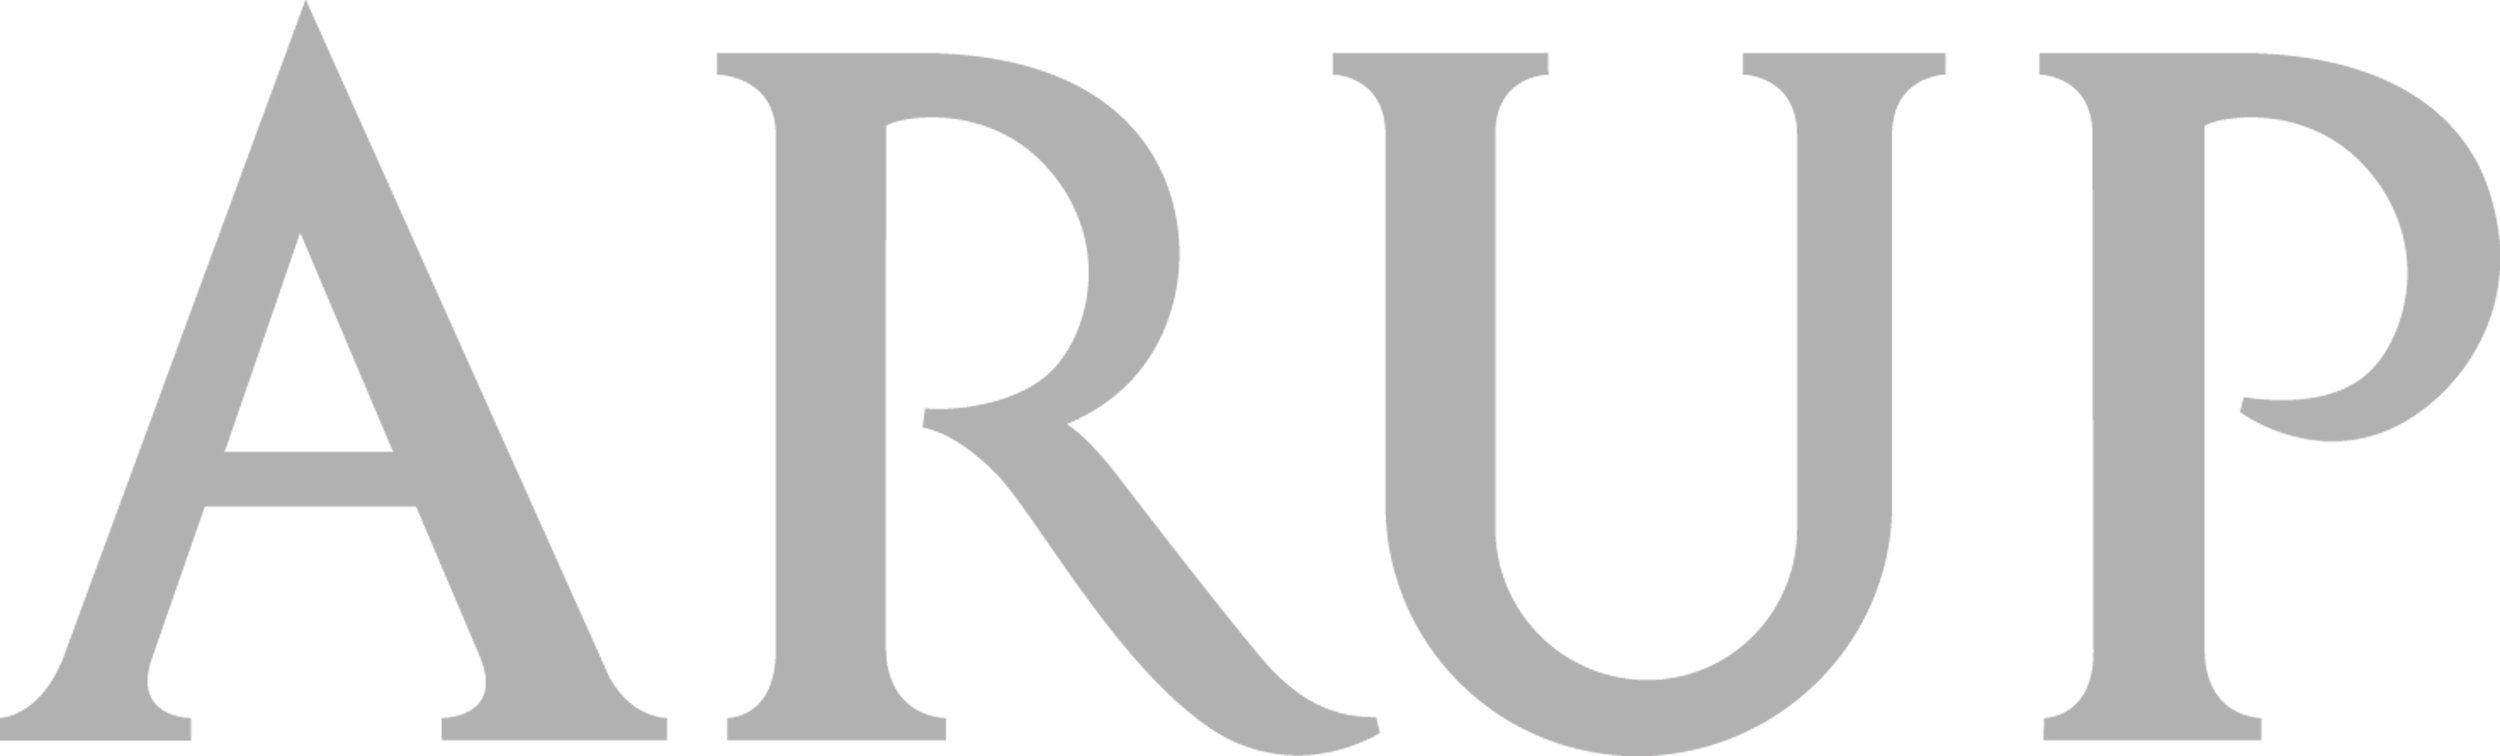 xArup-Logo.jpg.pagespeed.ic.6yFh7hkQbl.jpg